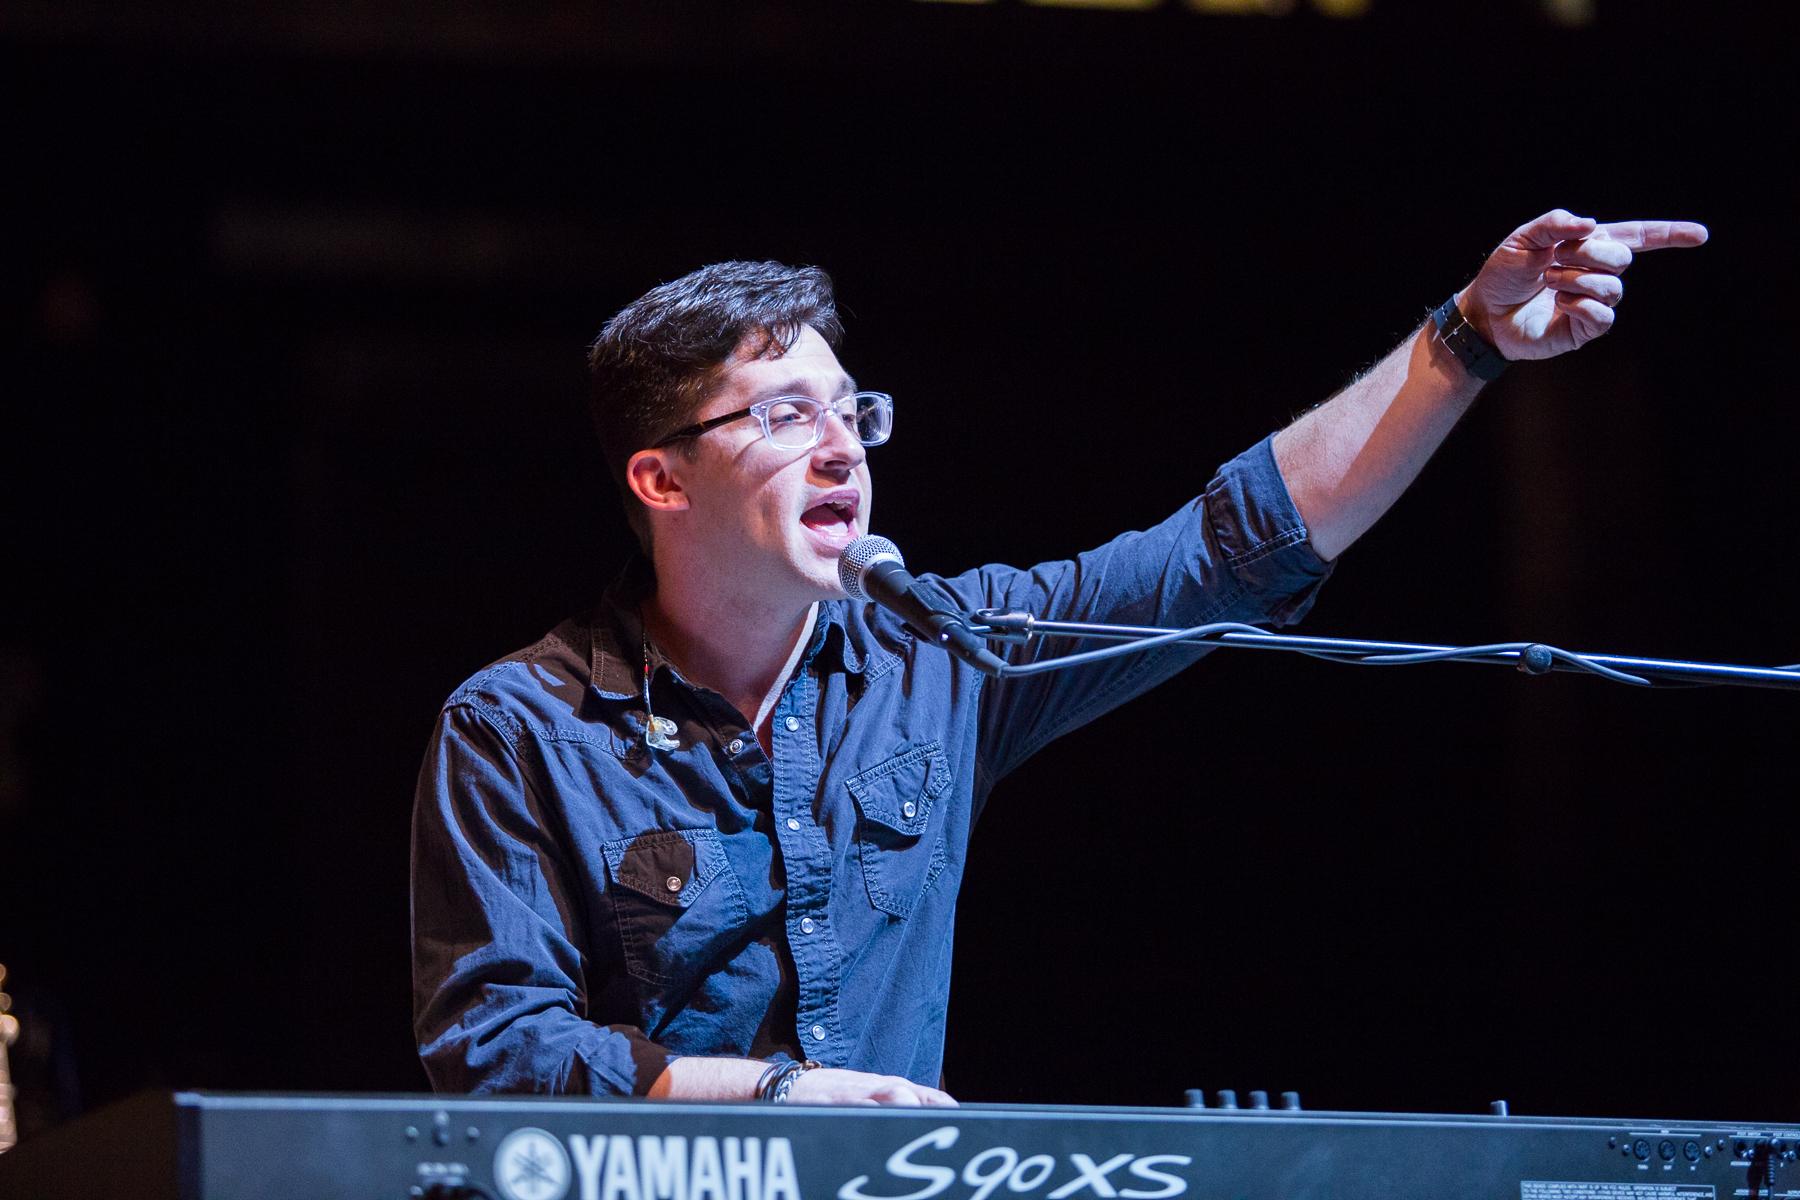 Josh Blakelsley